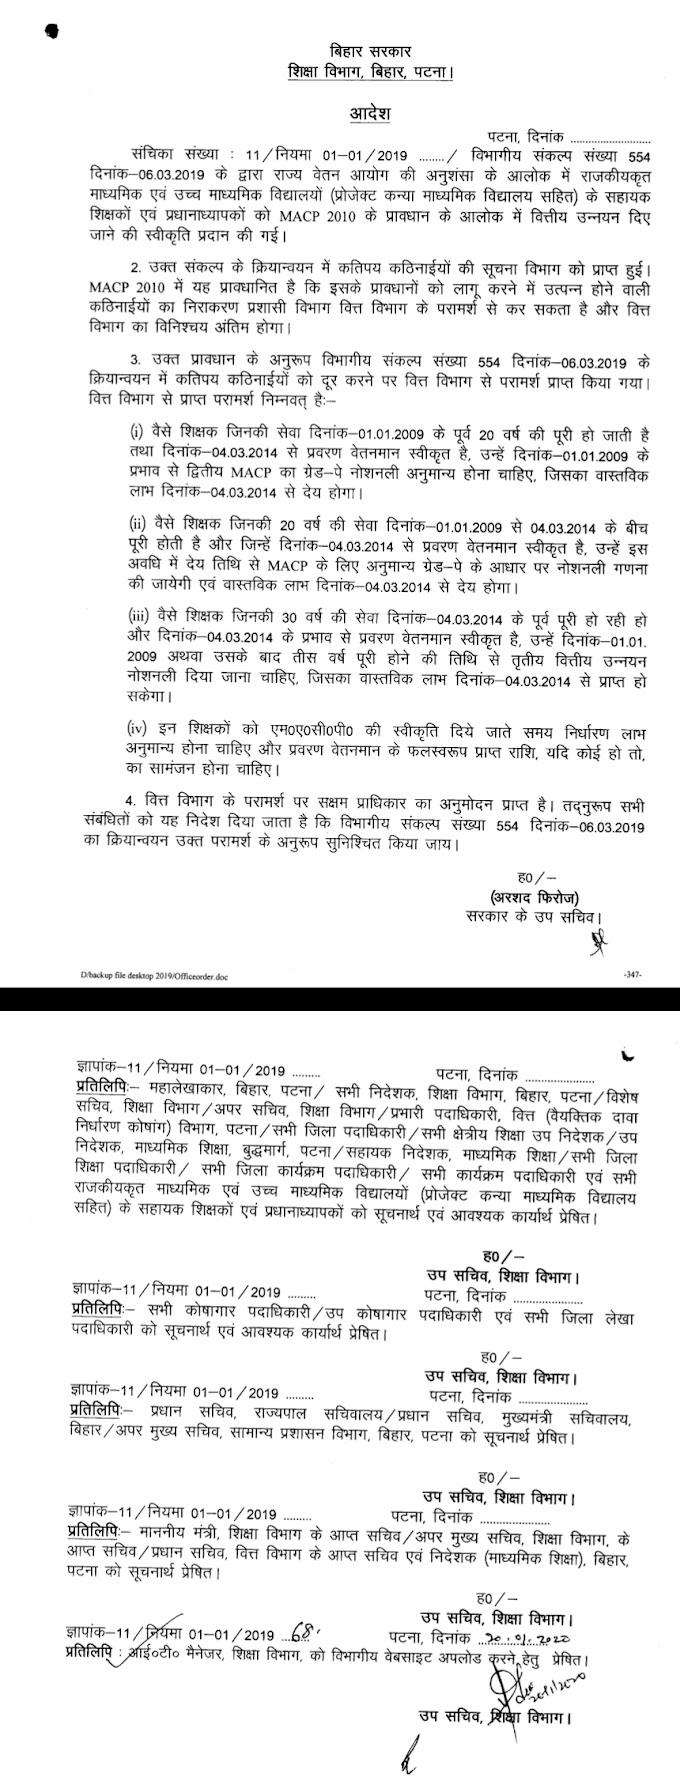 Edu dept. Govt of Bihar offer MACP to regular vetanman teachers